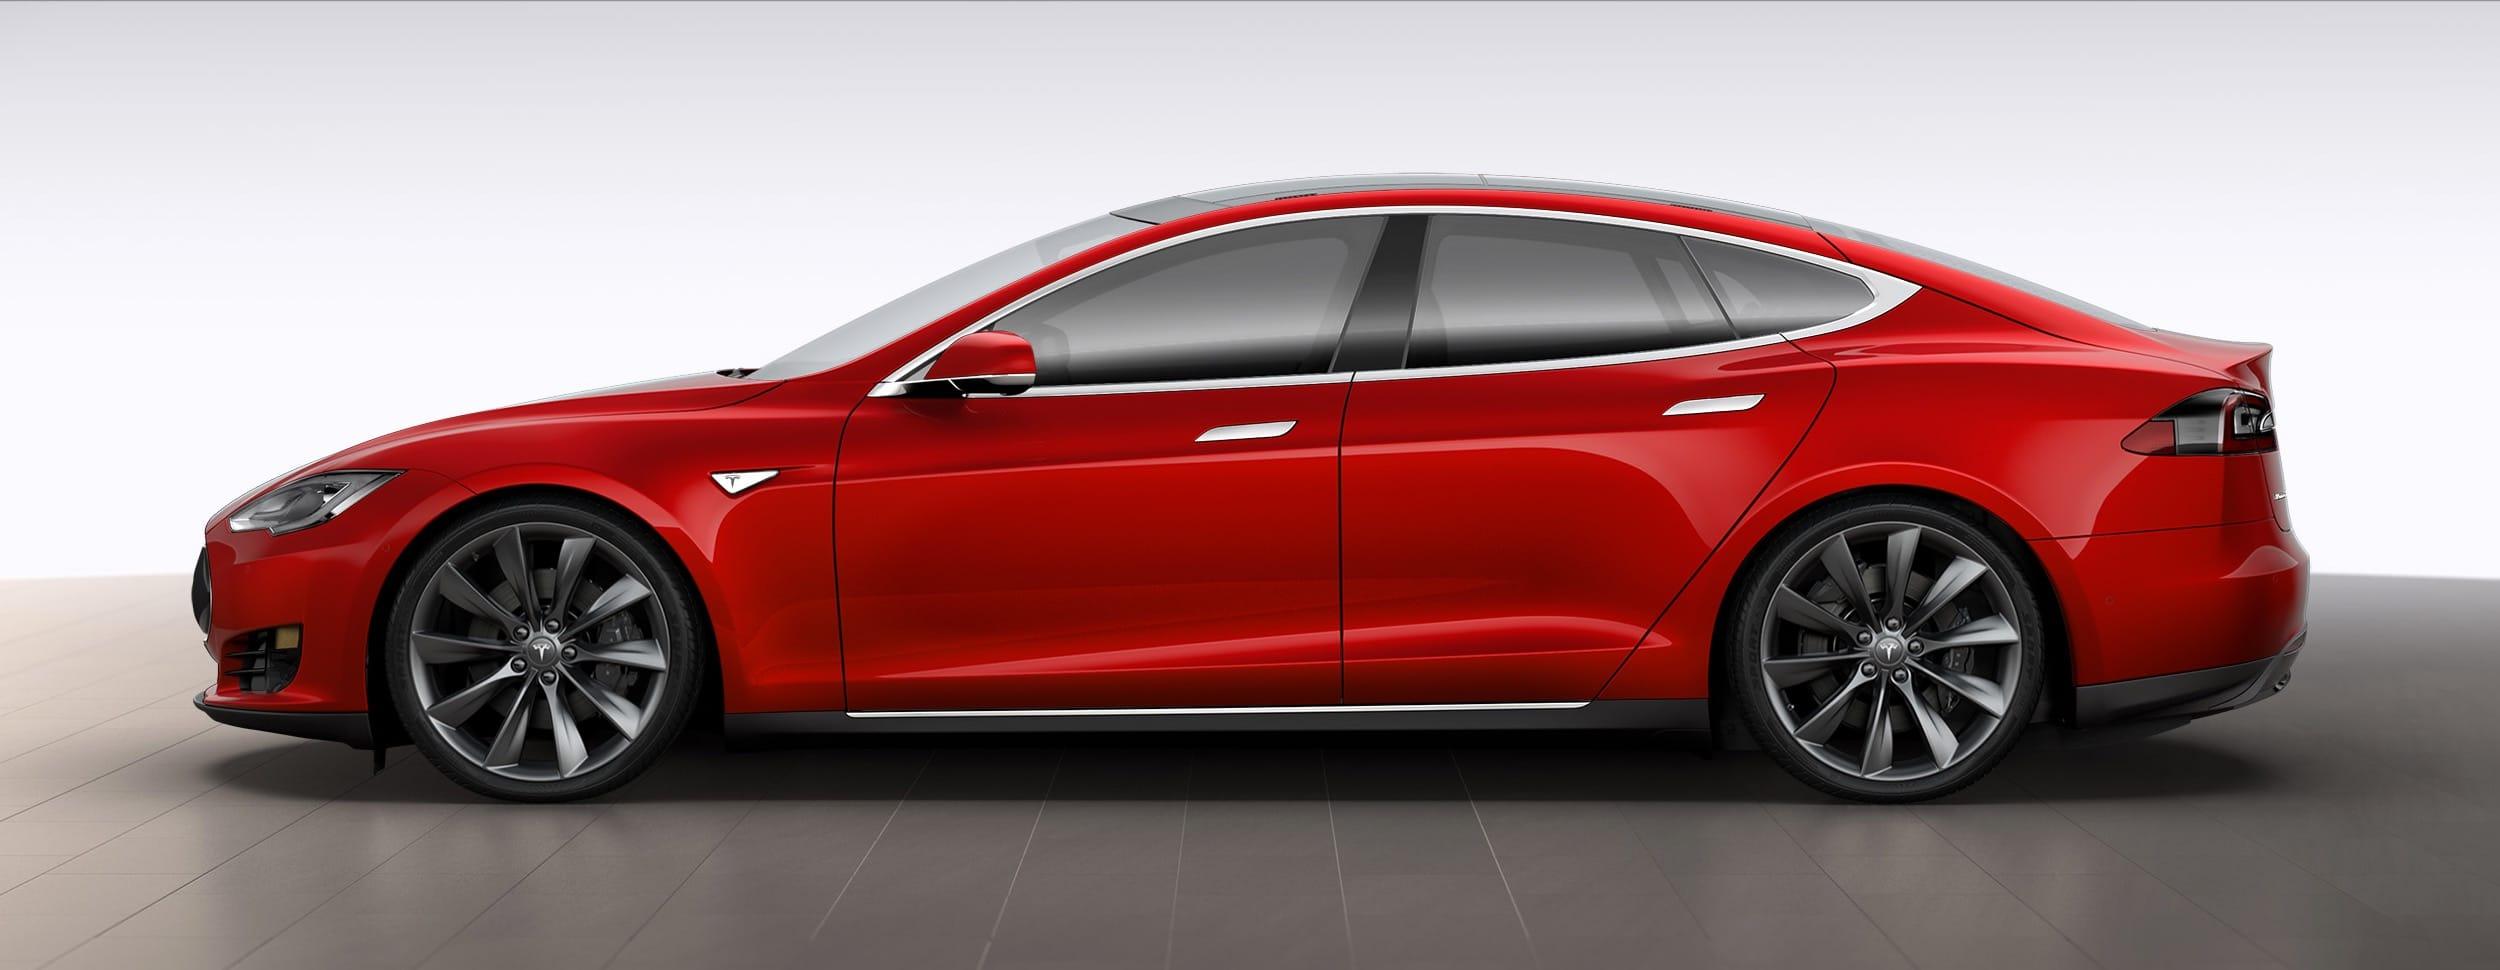 Tesla-Model-S-06-hero